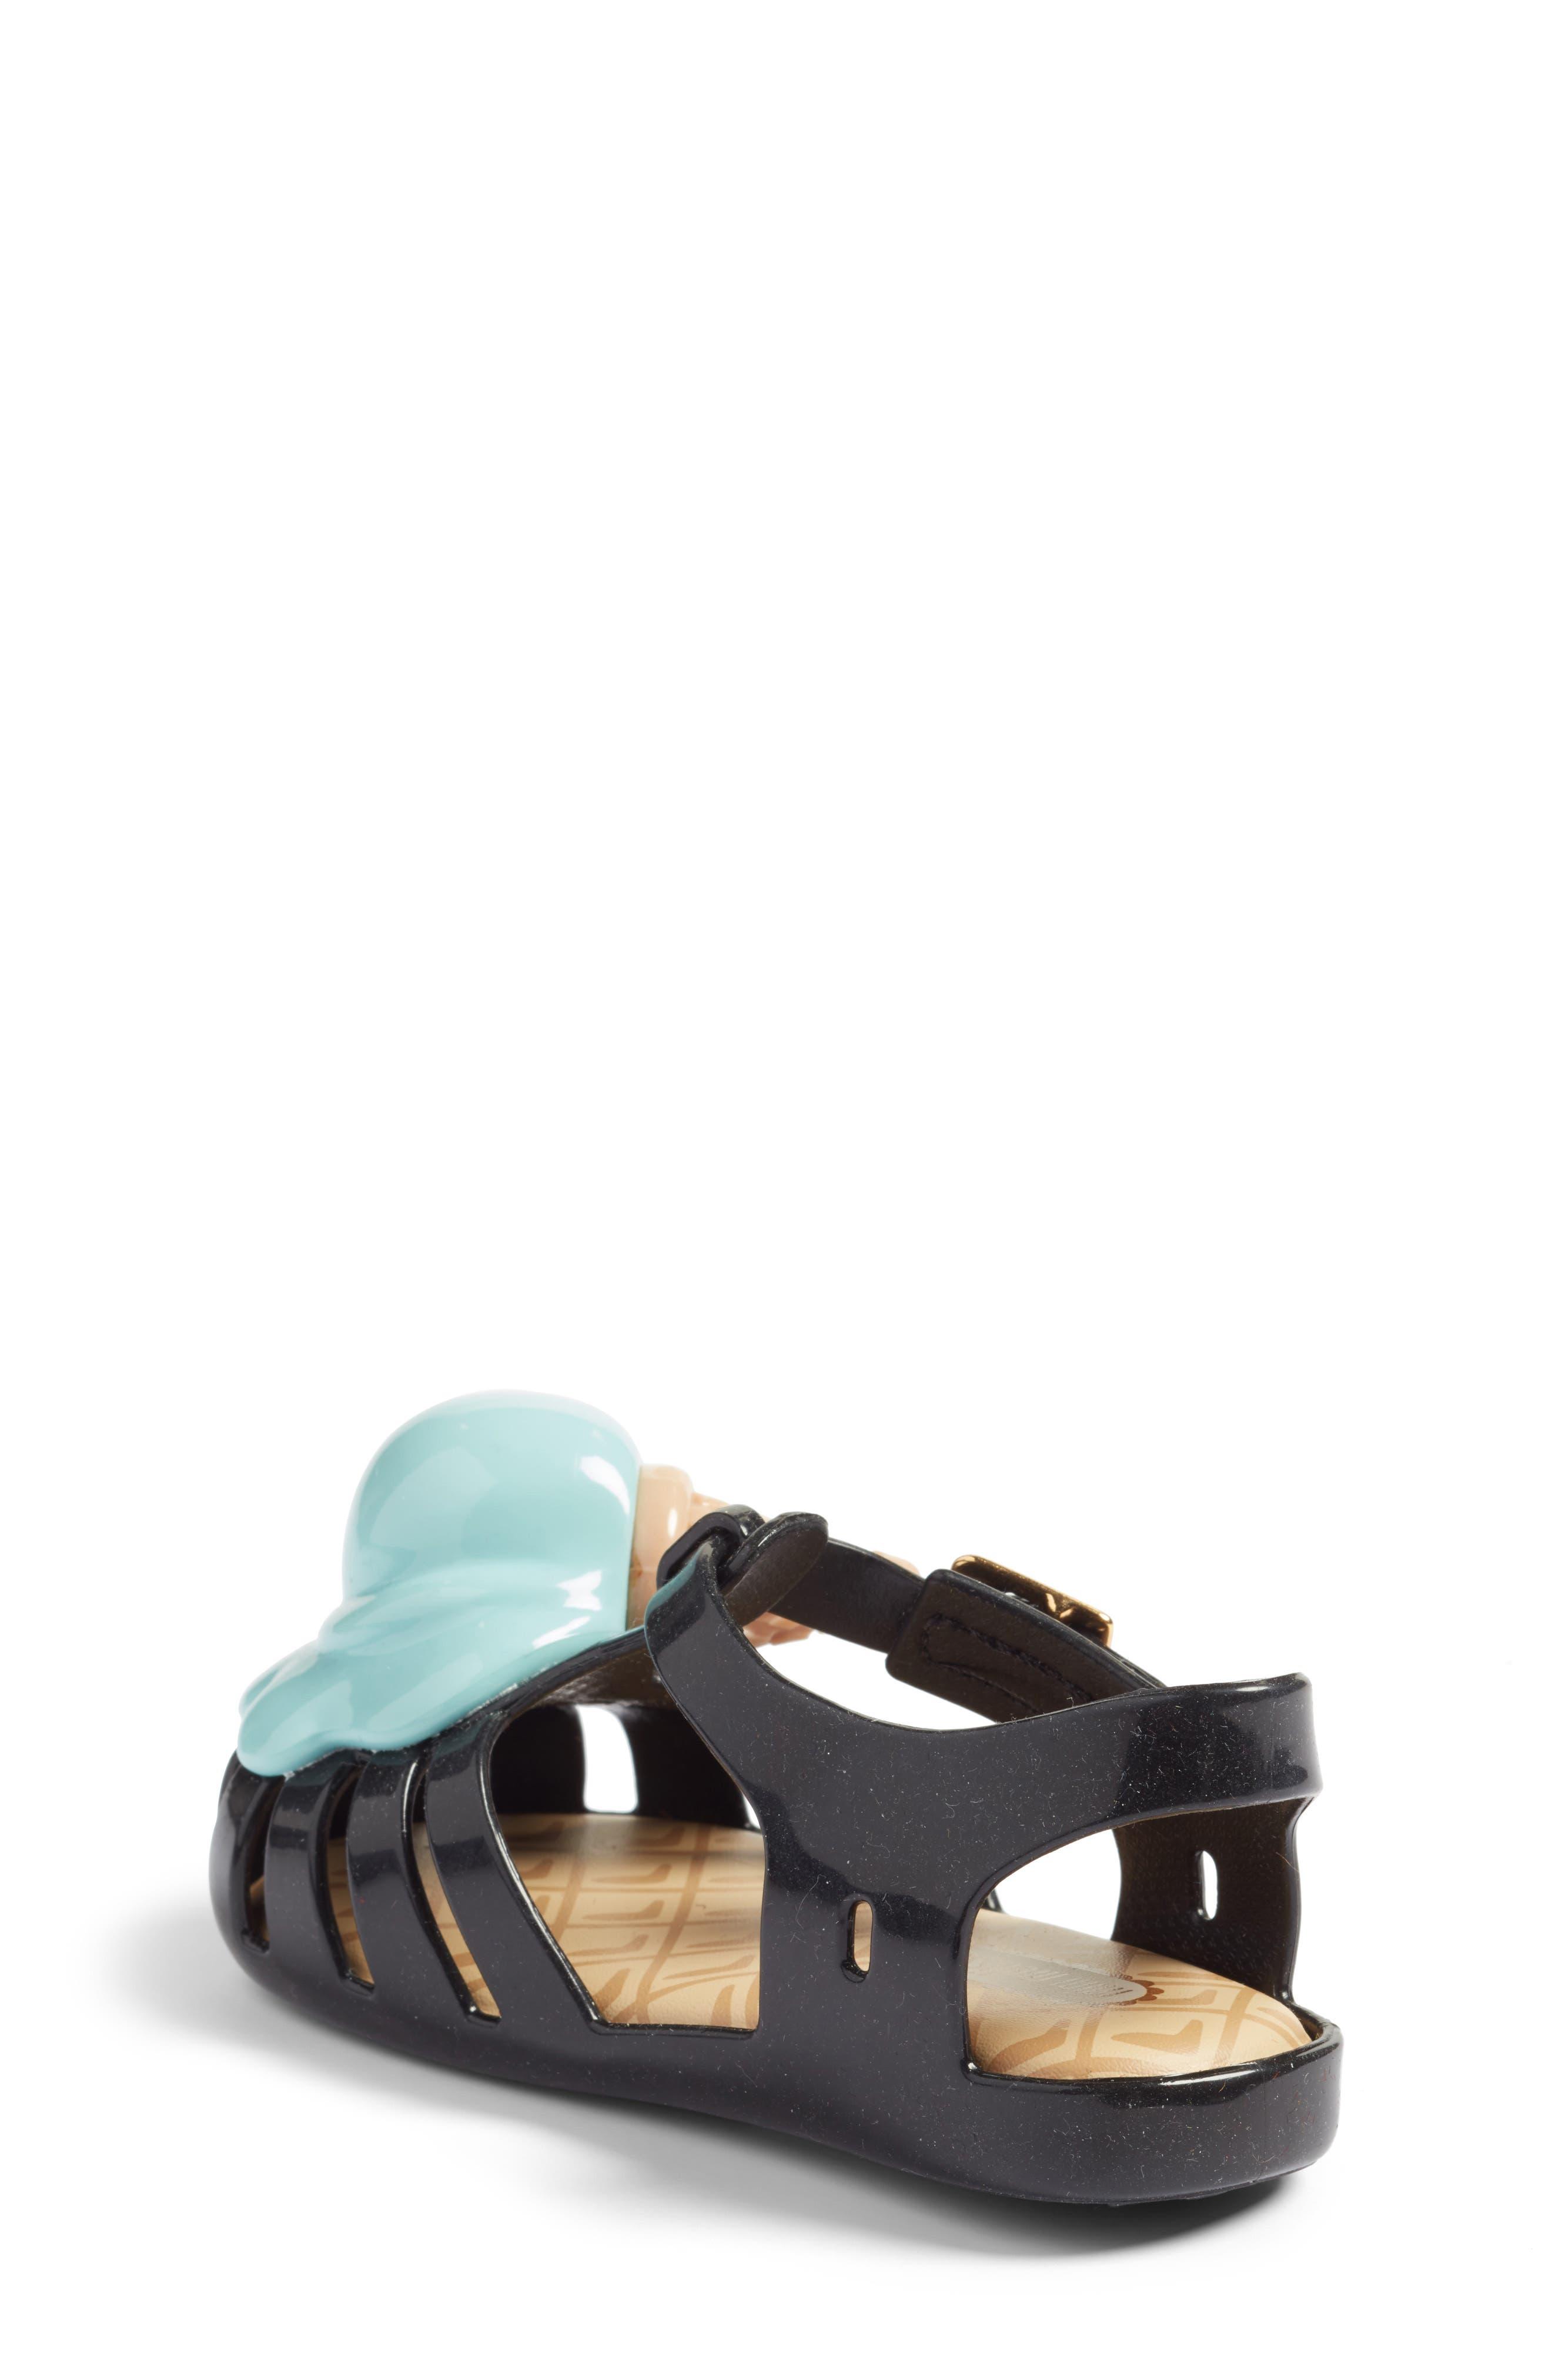 Aranha X Sandal,                             Alternate thumbnail 2, color,                             006